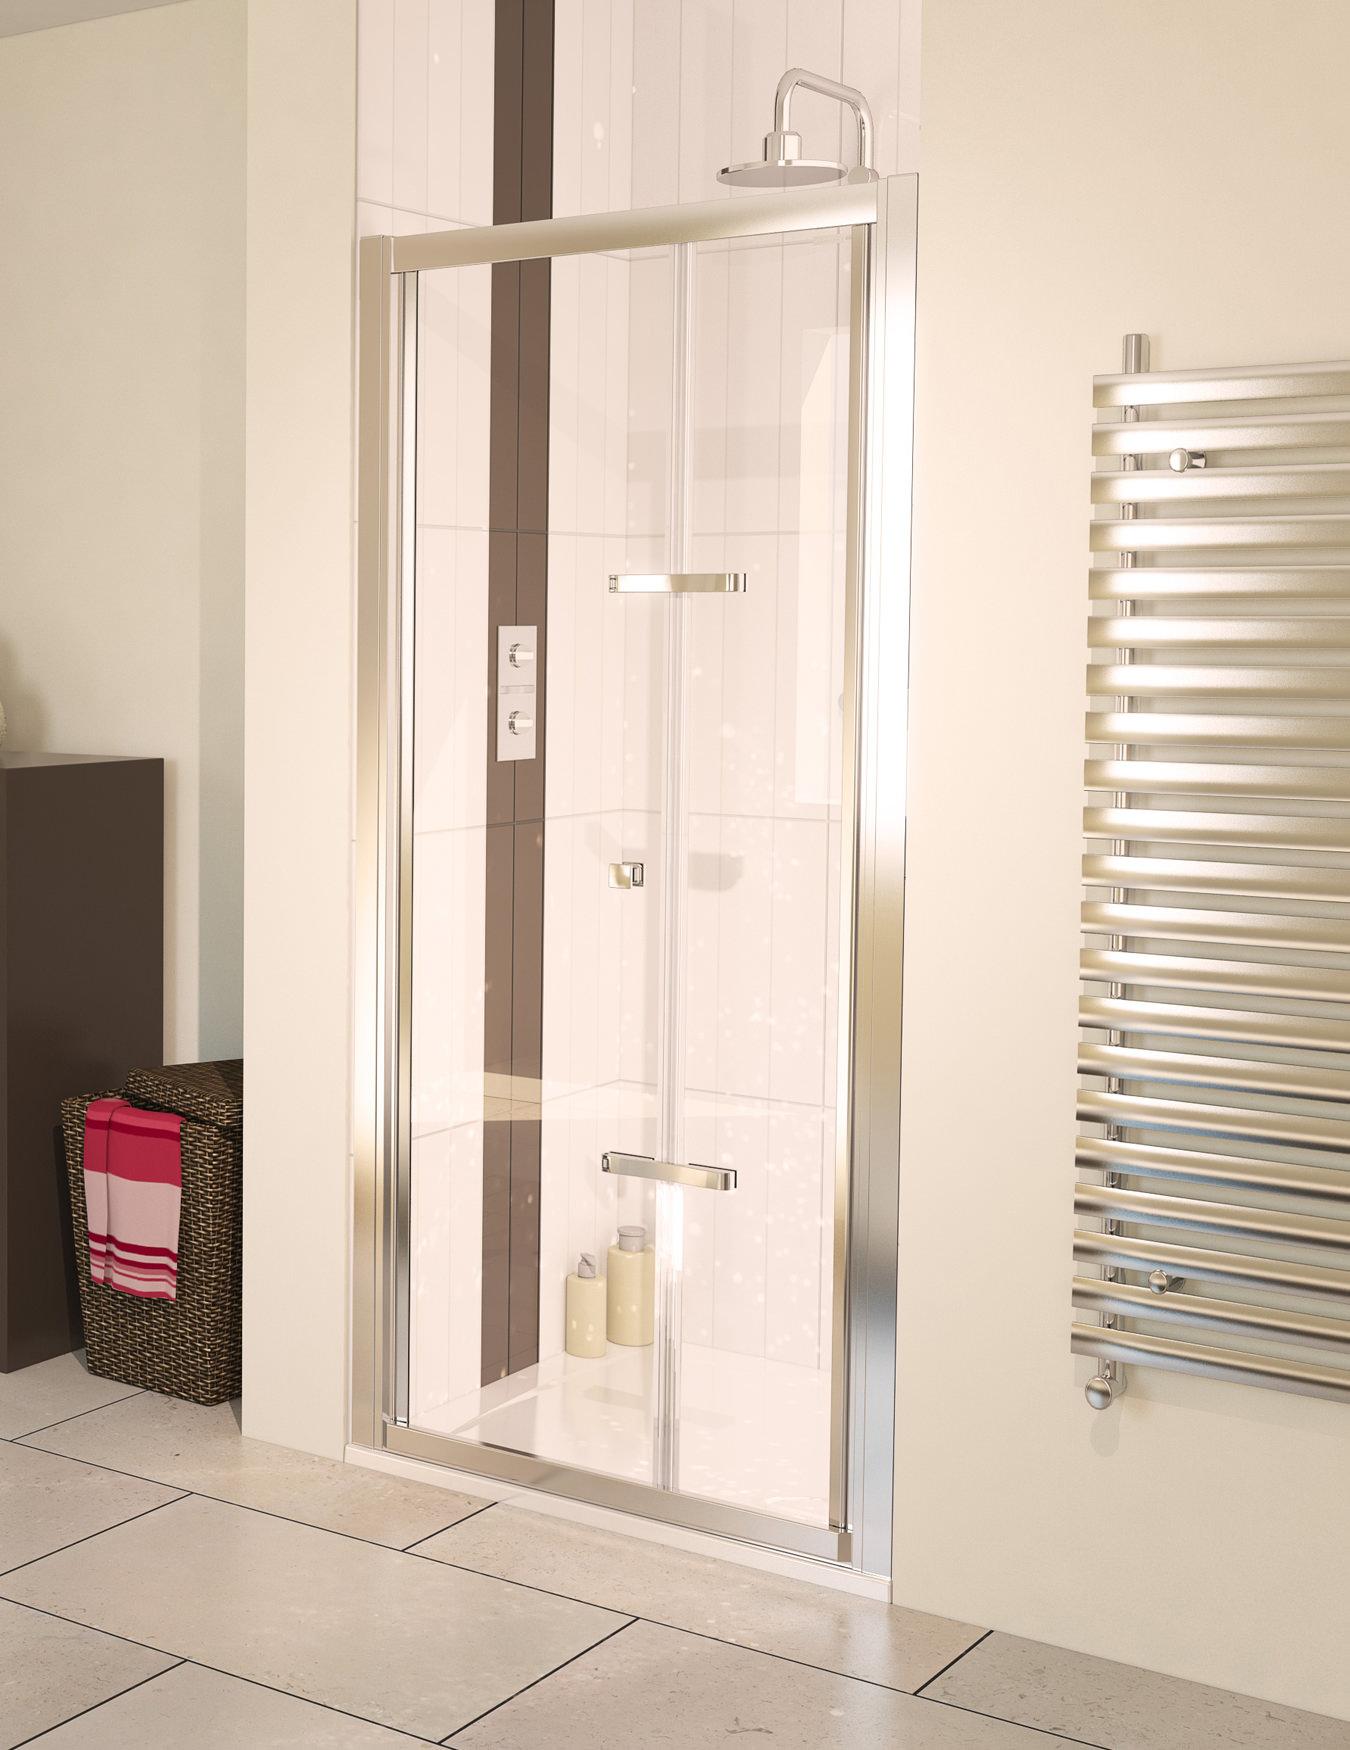 Bi fold shower door will give your bathroom an upscale look bath - Aqua 6 Bifold Polished Silver Frame Shower Door 760mm Aqualux